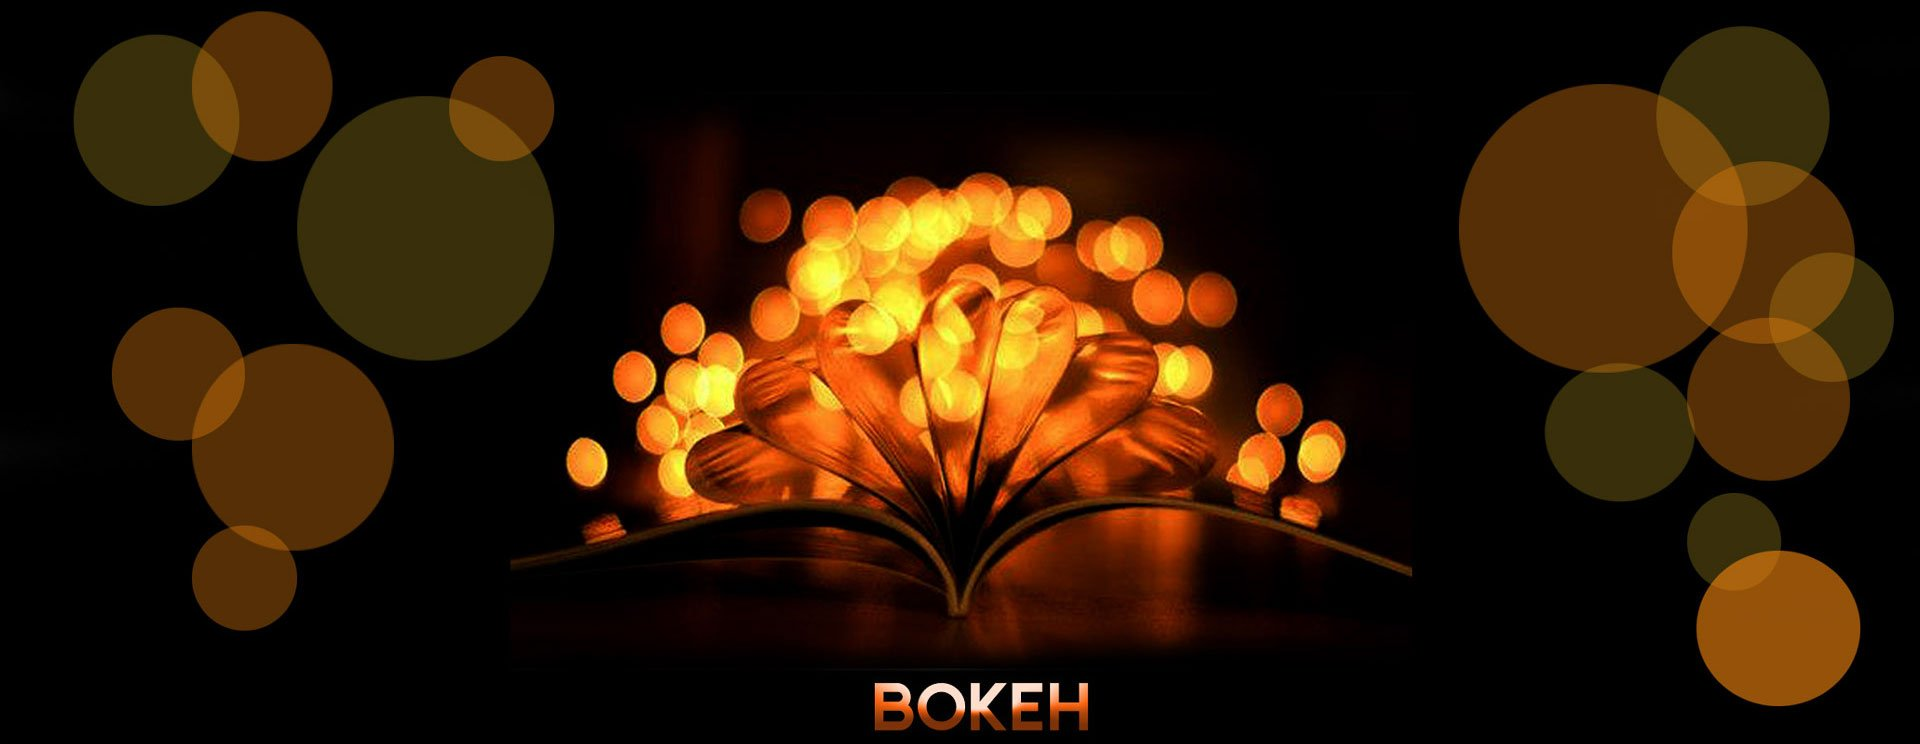 bokeh ax 1 1 - بوکه در عکاسی